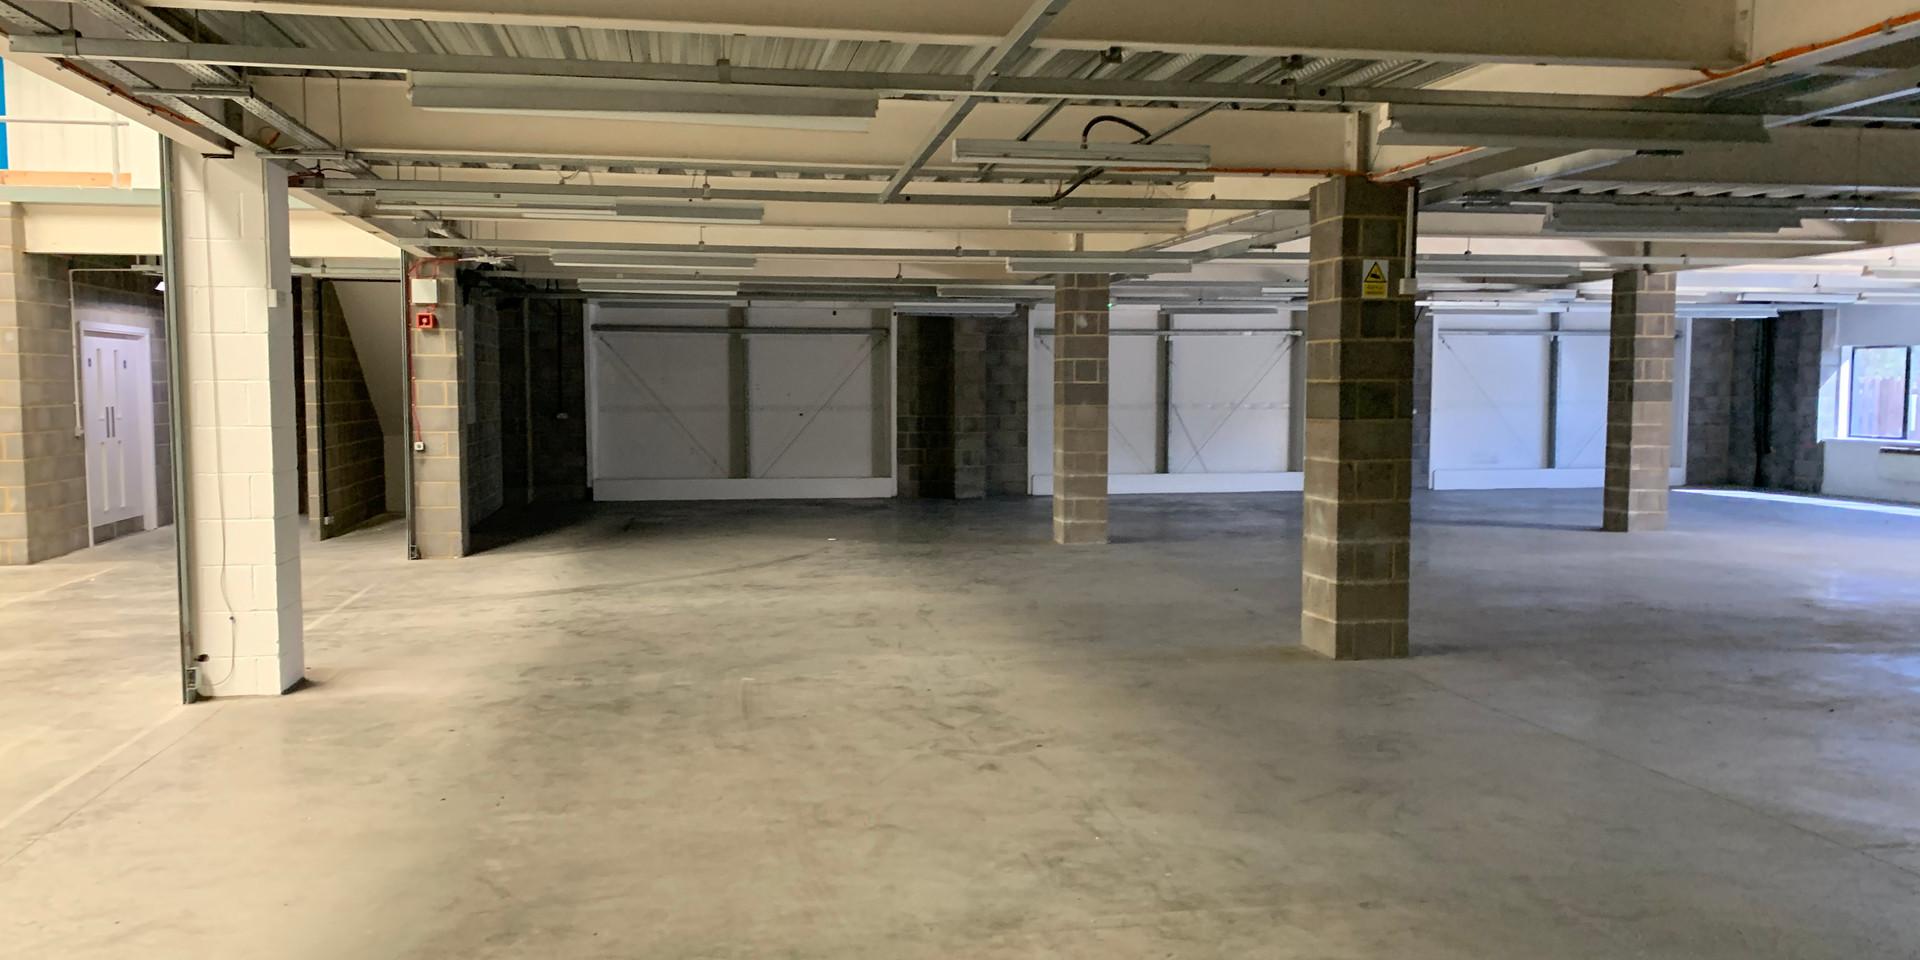 5 Penner Road, Interior Ground Floor